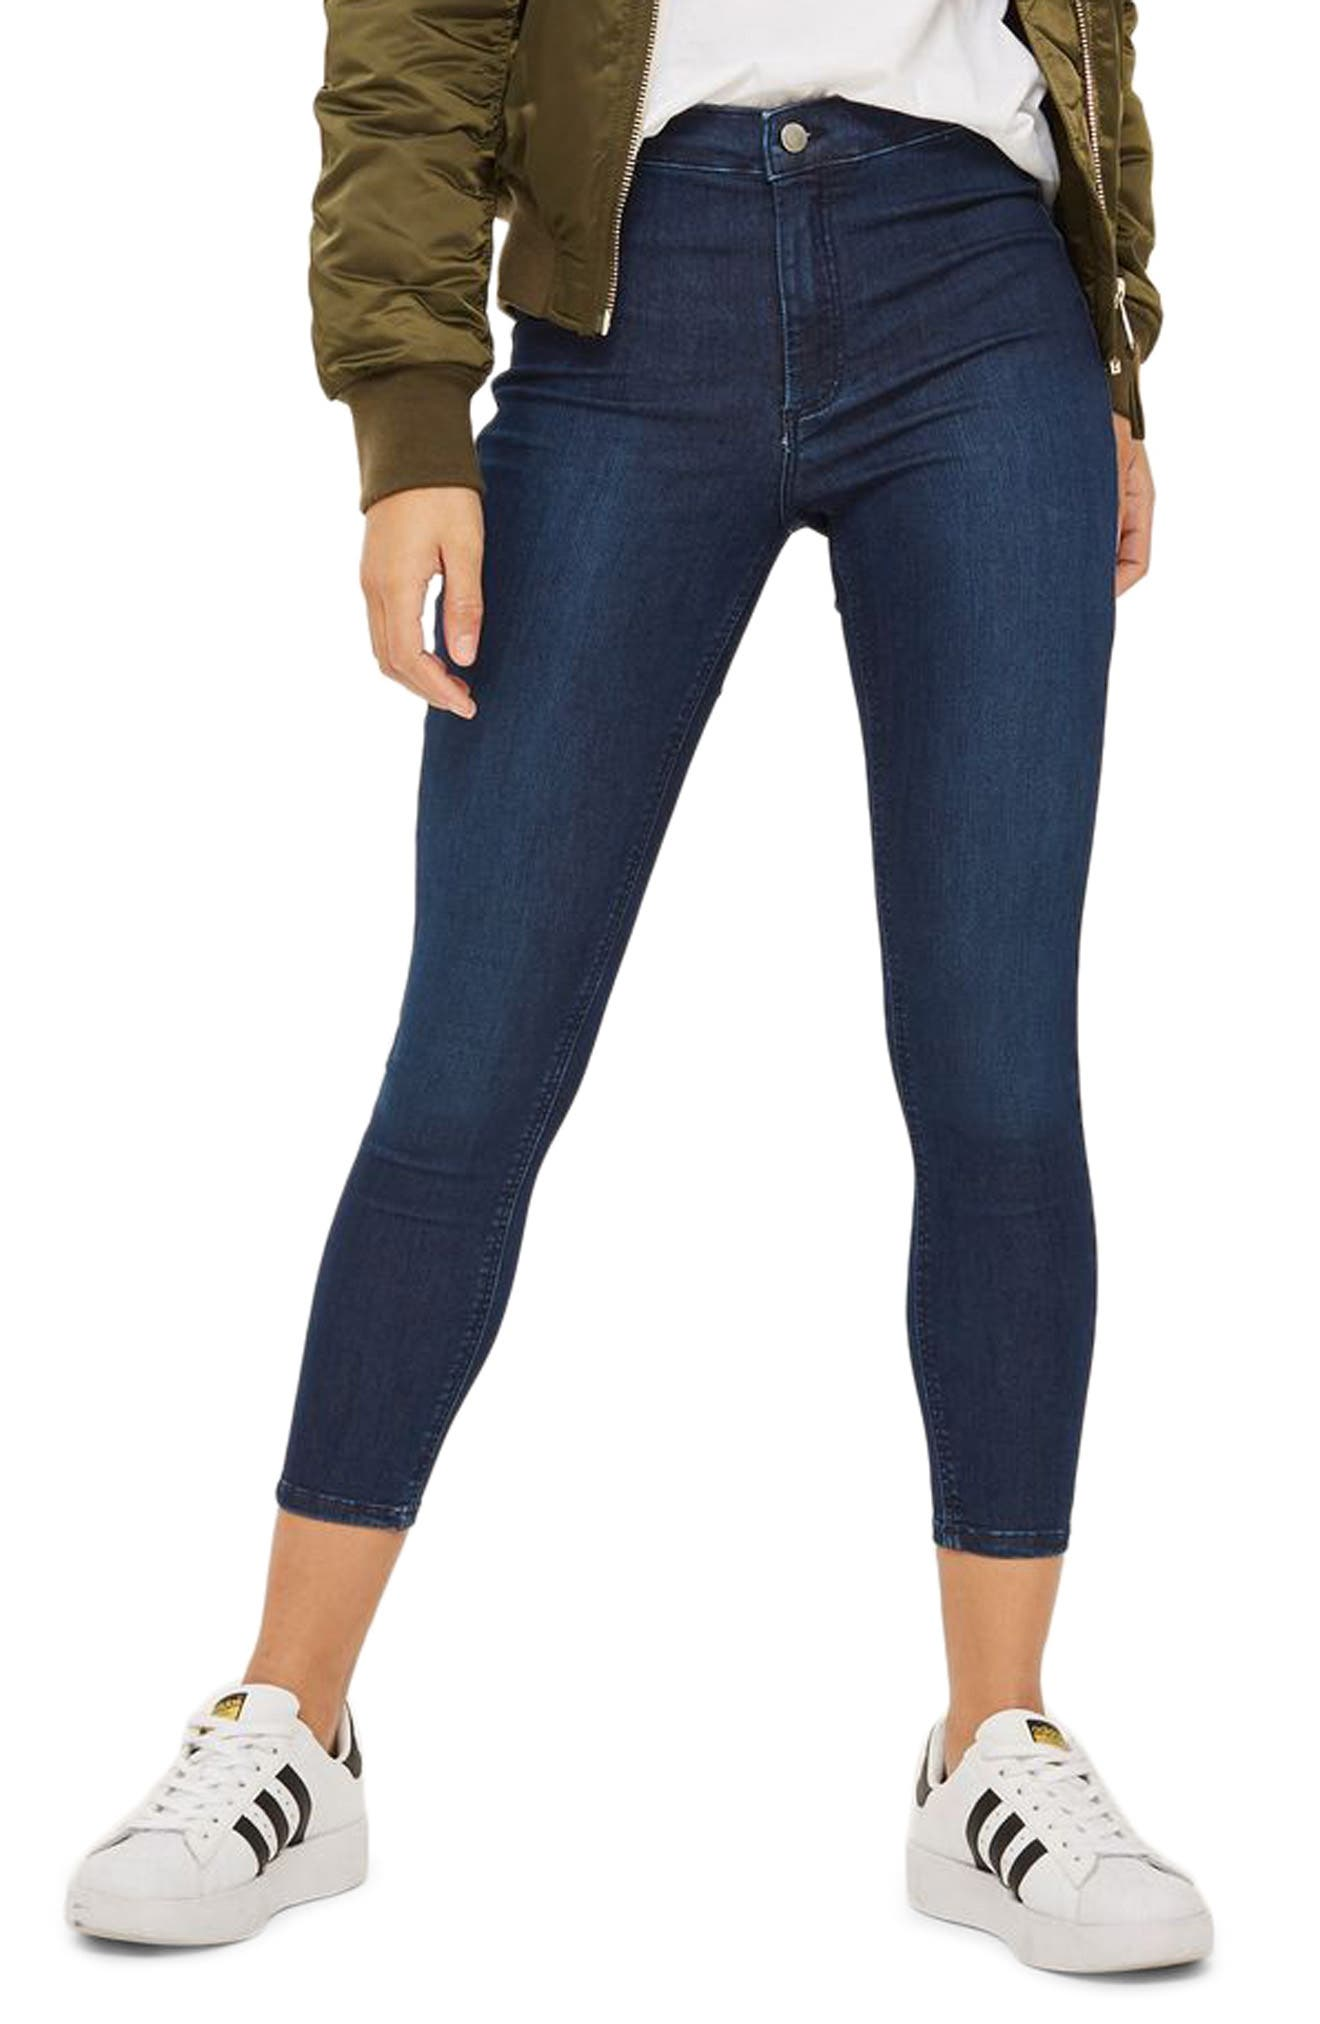 Joni High Waist Skinny Jeans,                             Main thumbnail 1, color,                             401